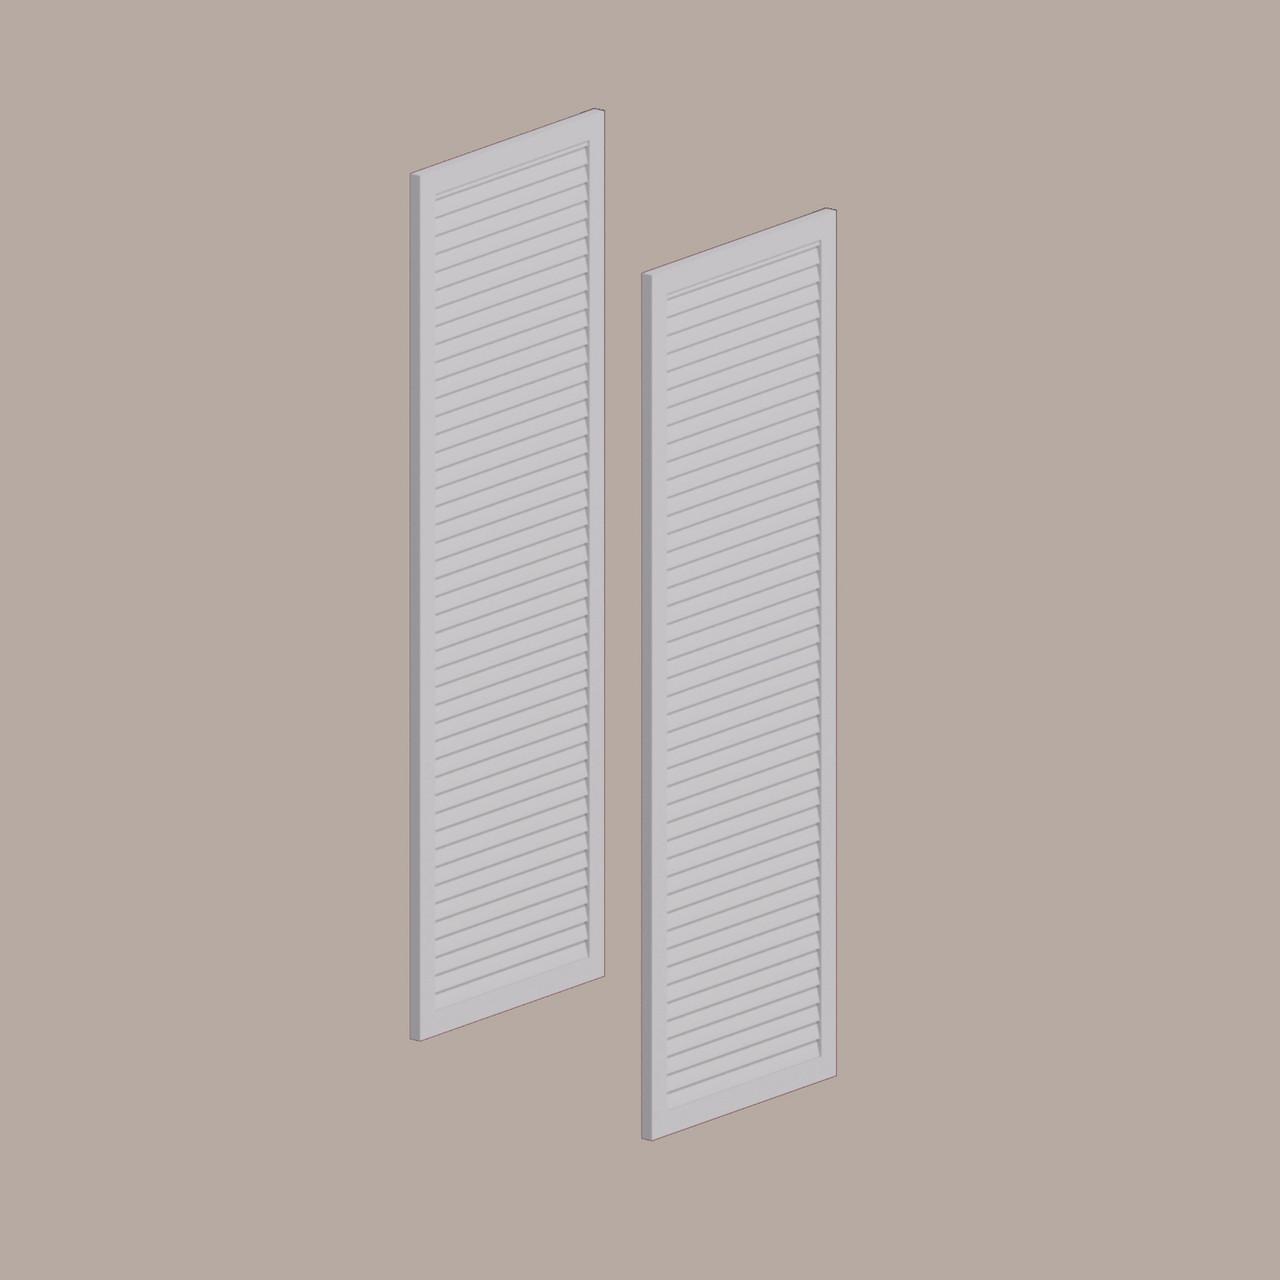 Fypon shutter lvsh16x54fnb Fypon exterior shutters